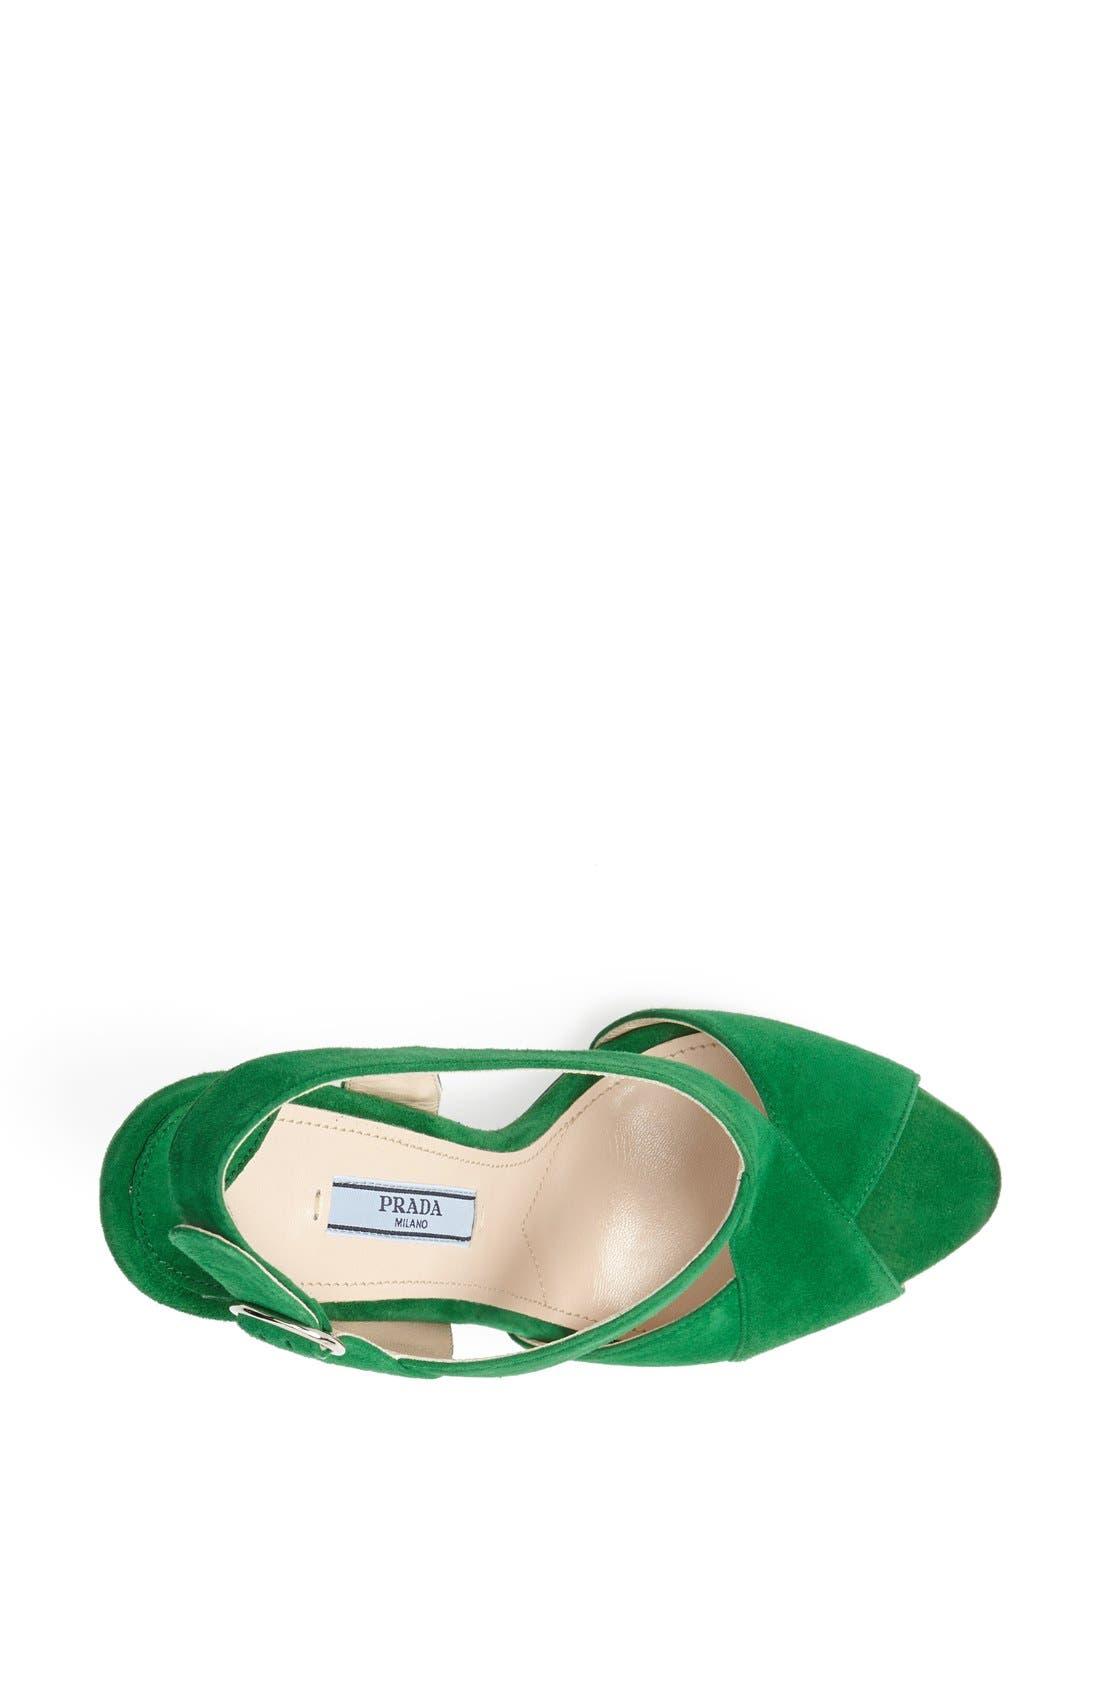 Alternate Image 3  - Prada 'Hourglass' Slingback Sandal